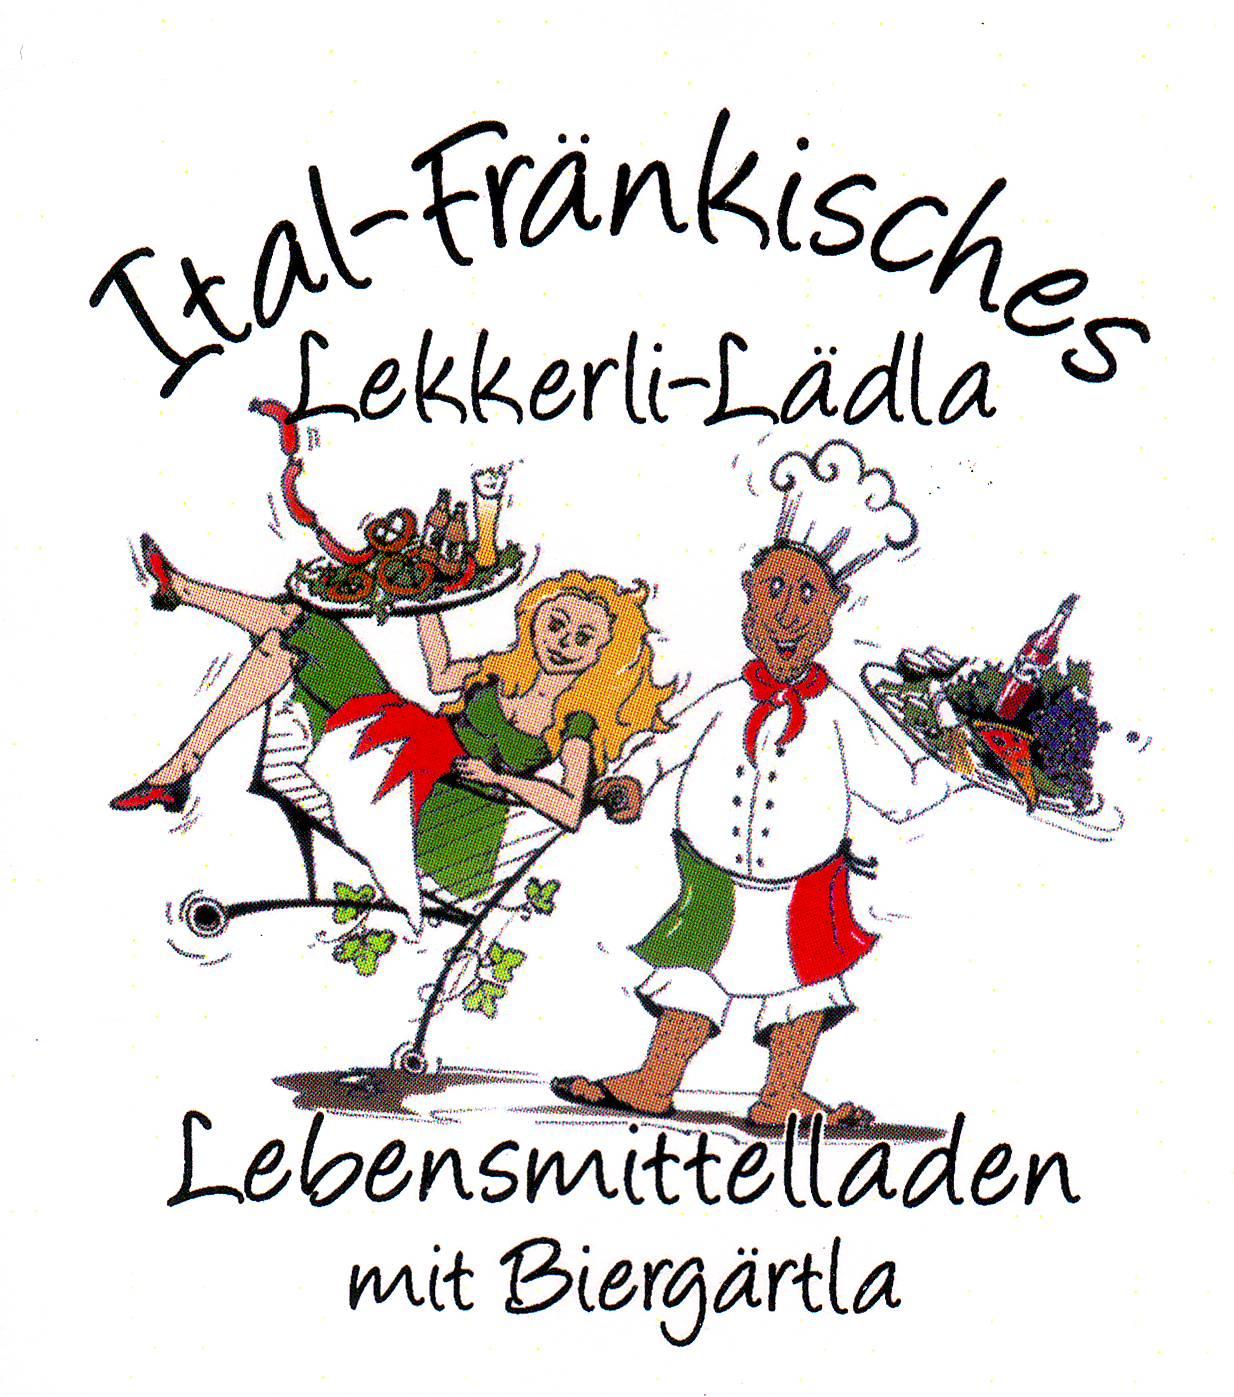 Ital.-Fränkisches Lekkerli-Lädla am Campingplatz Stephanie Horst<br />